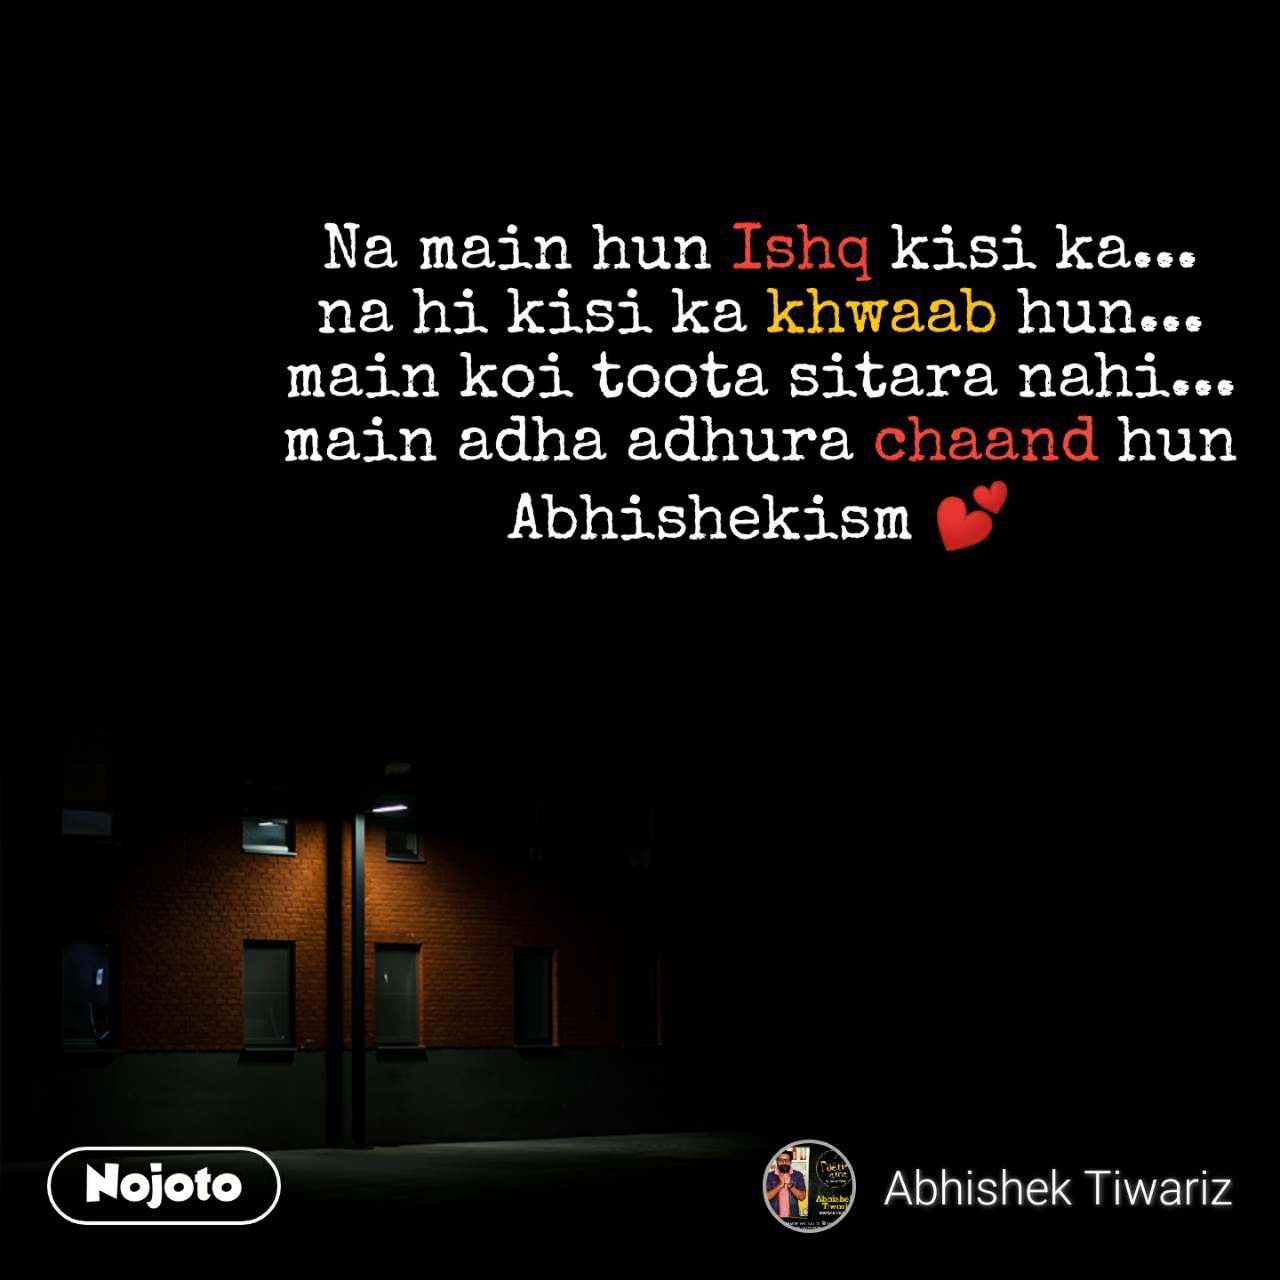 Na main hun Ishq kisi ka... na hi kisi ka khwaab hun... main koi toota sitara nahi... main adha adhura chaand hun Abhishekism 💕